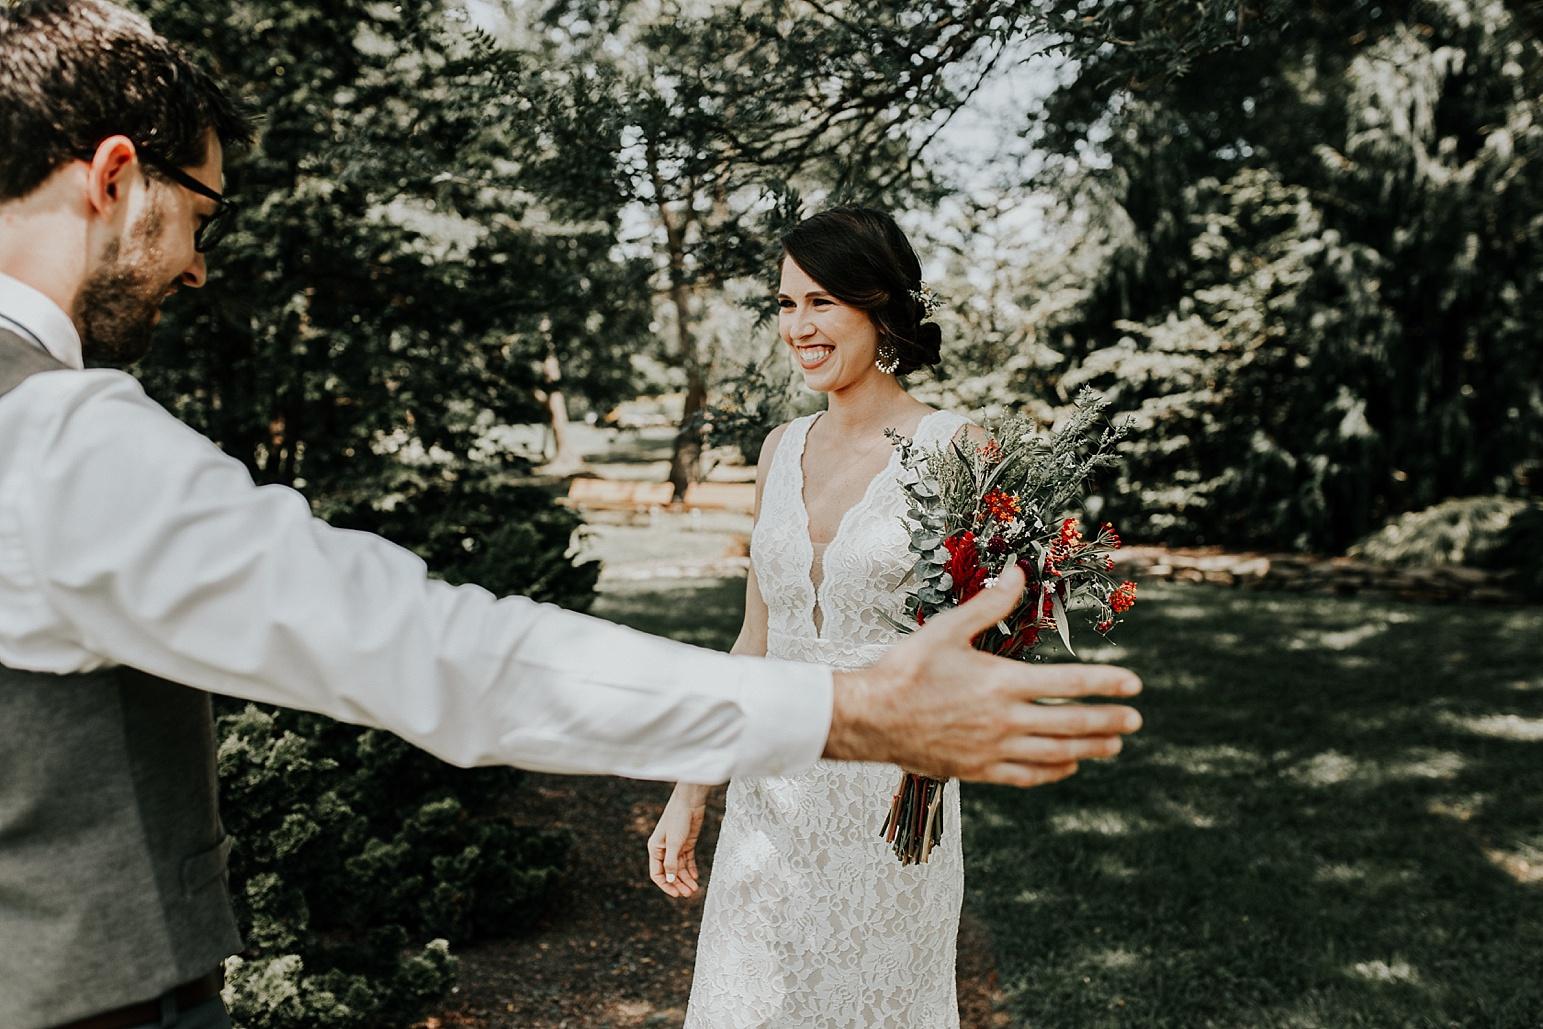 ashley_sara_photography_pittsburgh-wedding-photographer_ohio-wedding-photographer_destination-wedding-photographer15.jpg